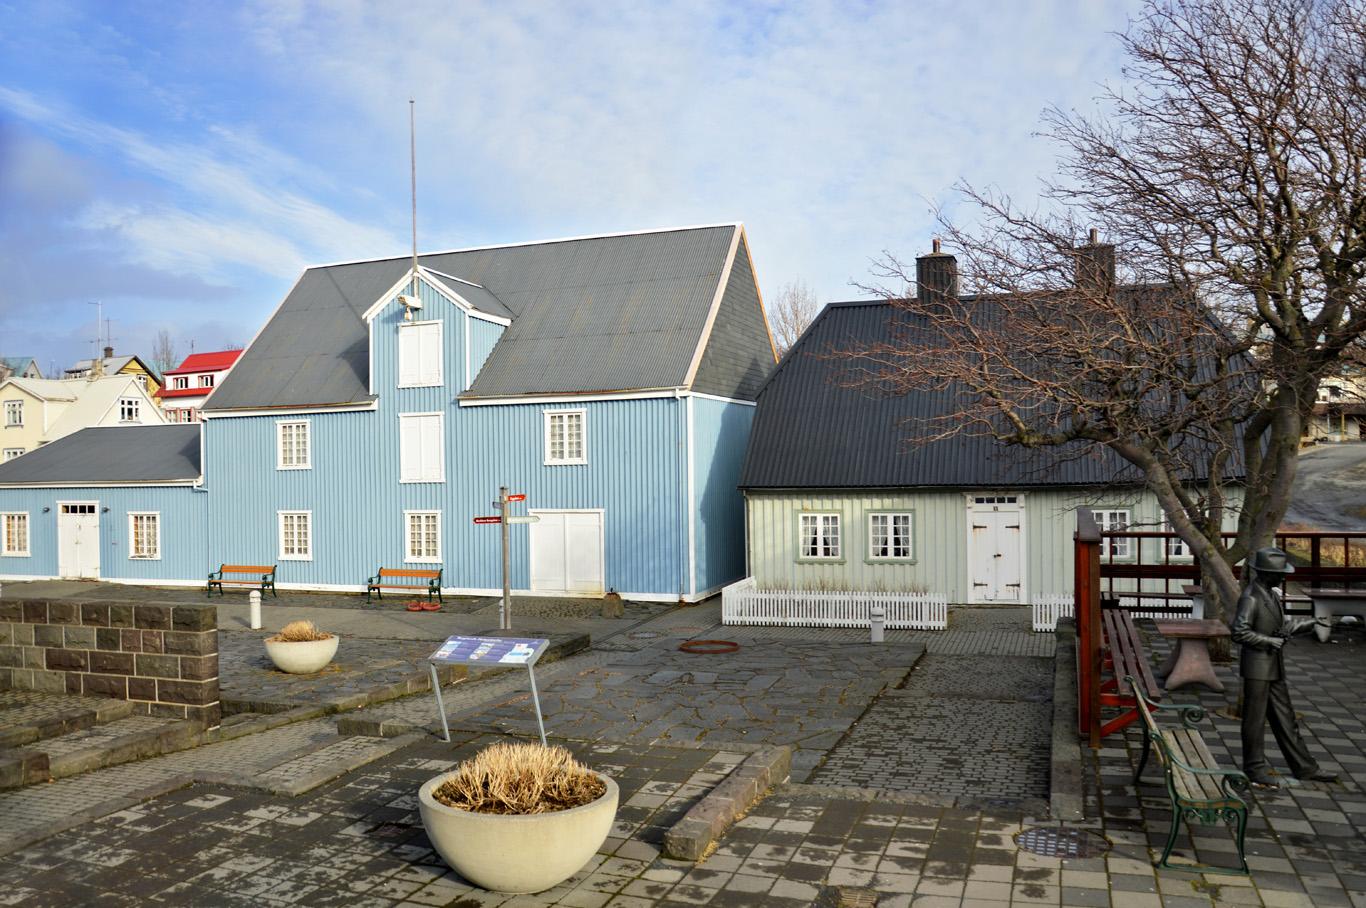 Typical houses around Reykjavik